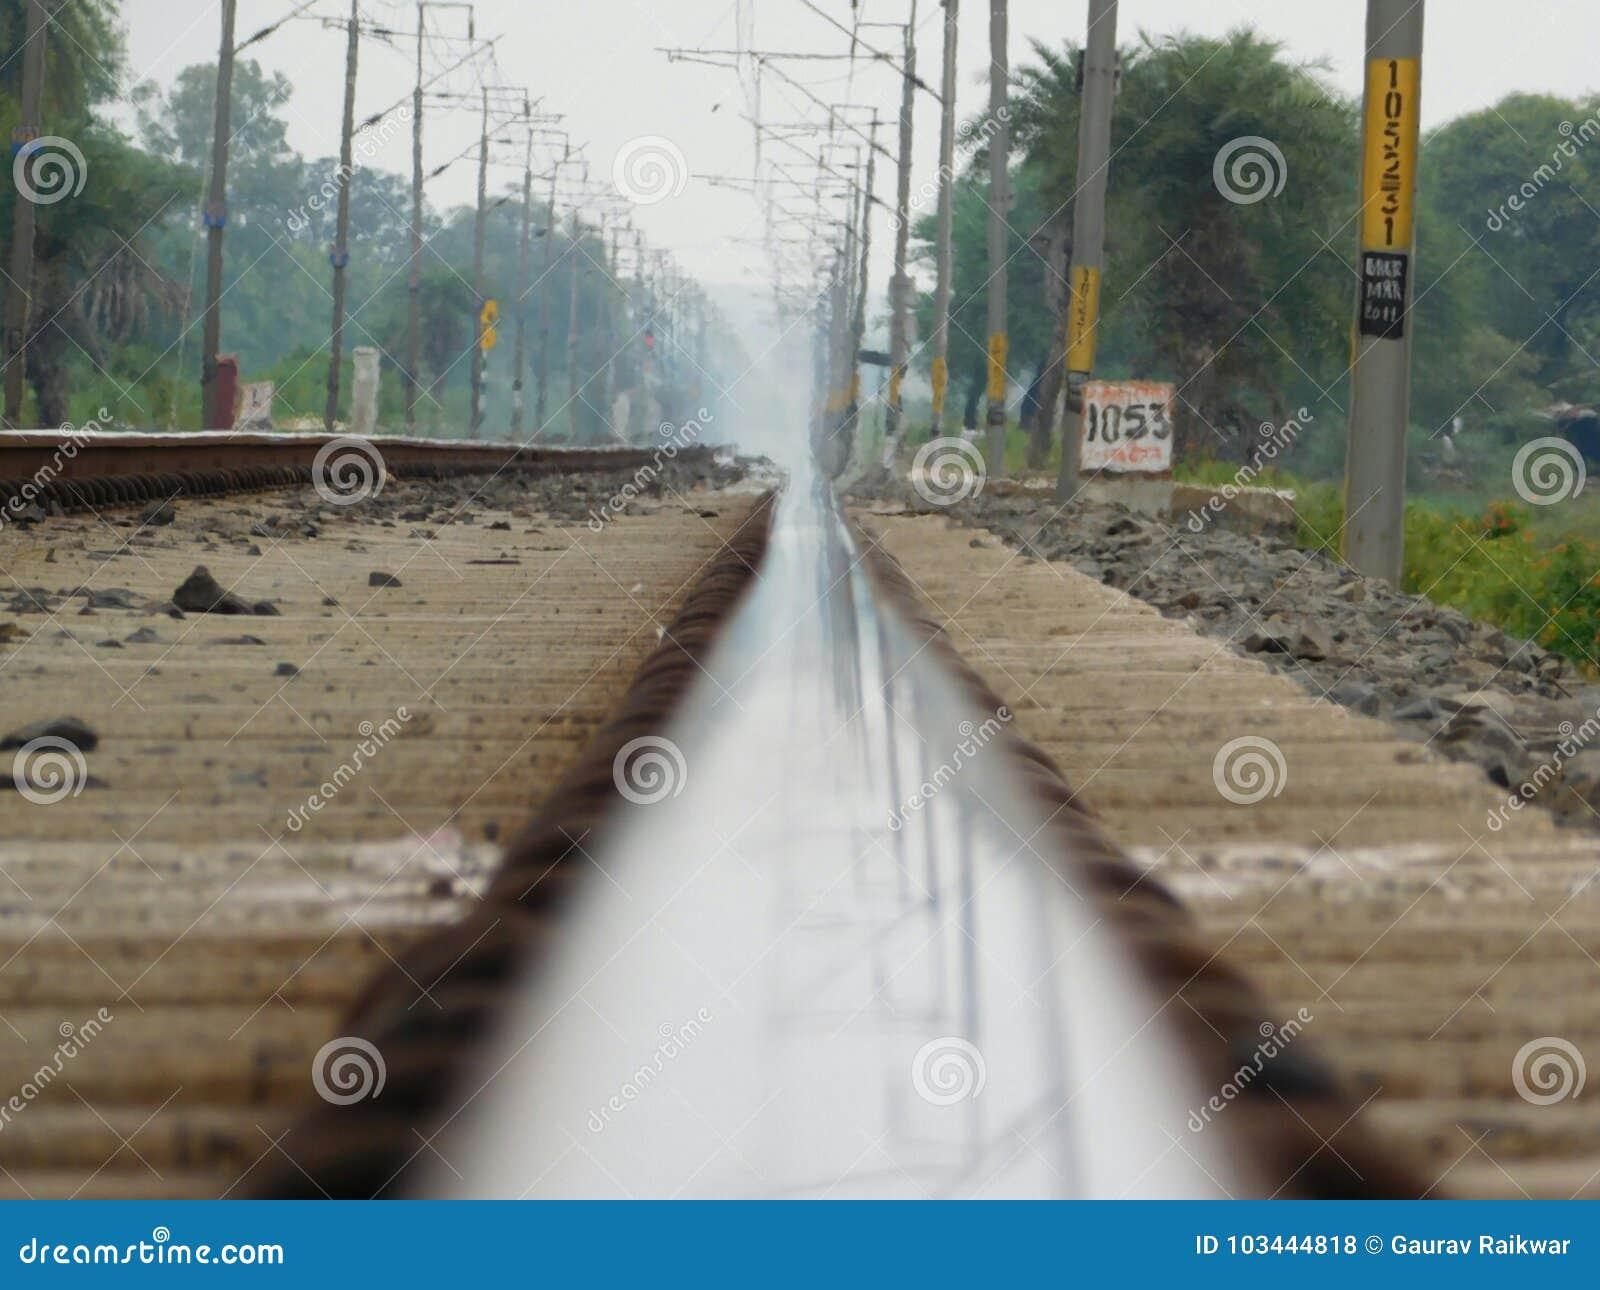 amazing railway tracks in india